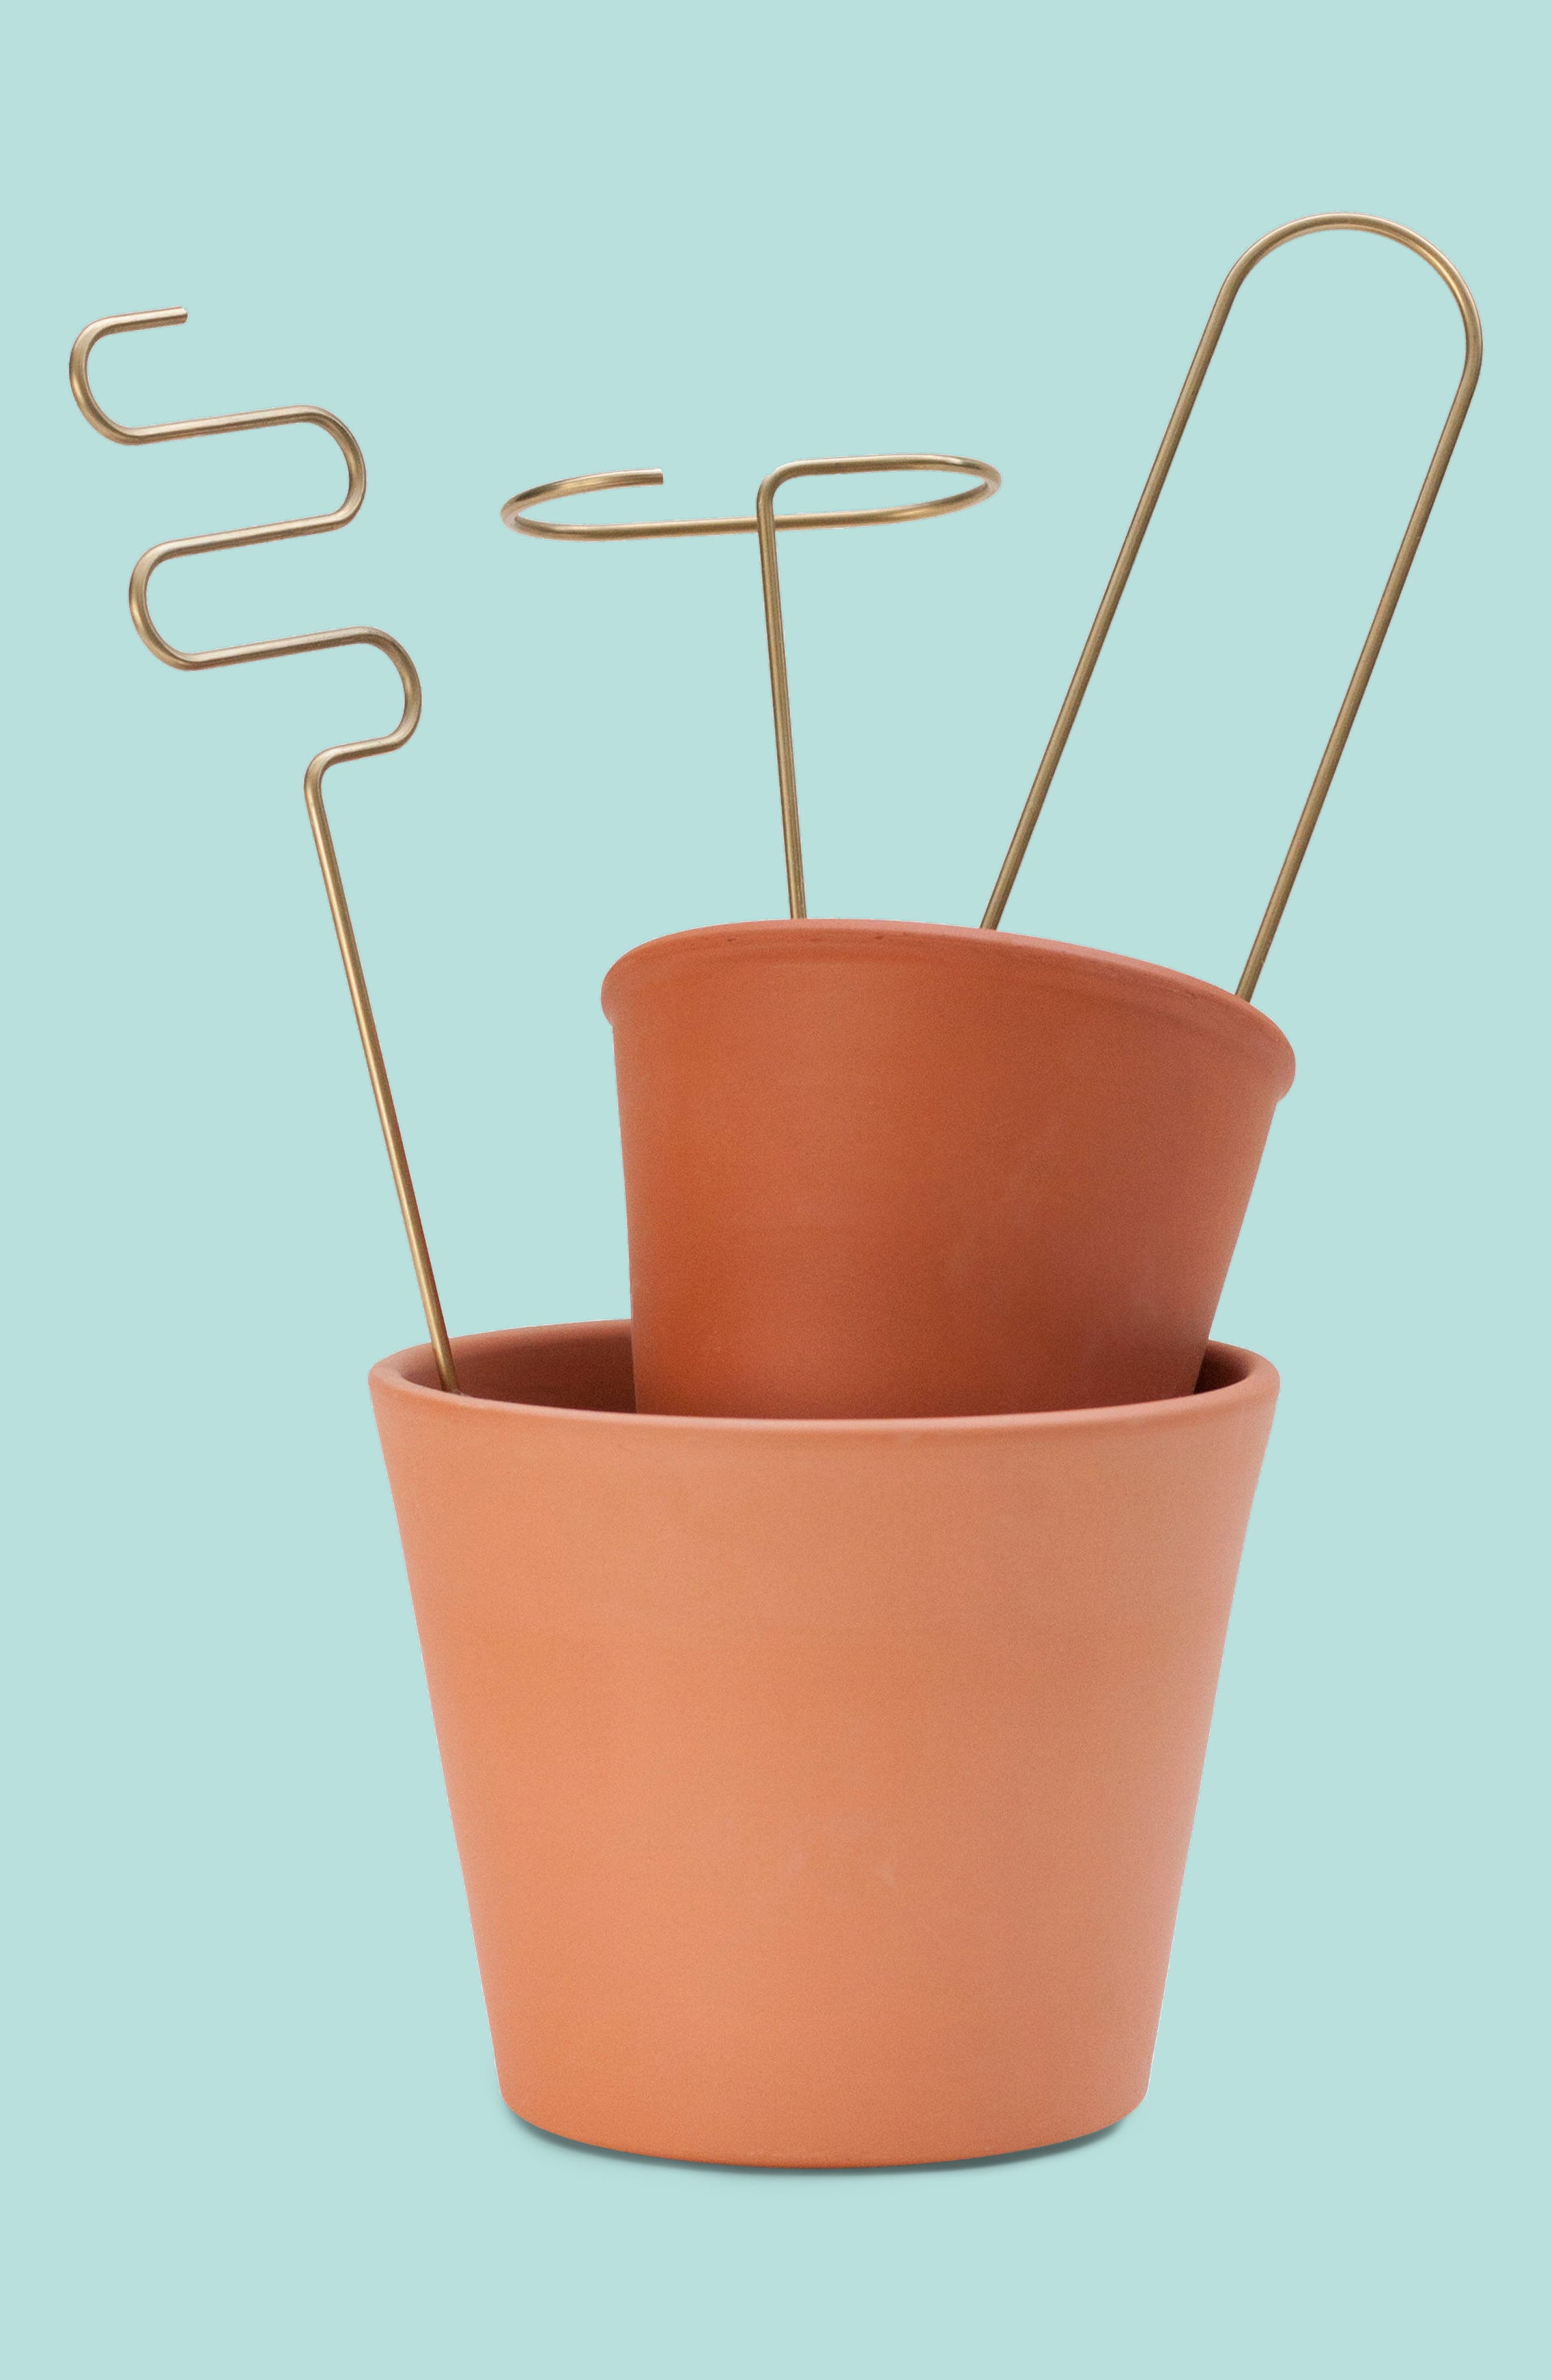 Set of 3 Plant Sticks,                             Main thumbnail 1, color,                             BRASS